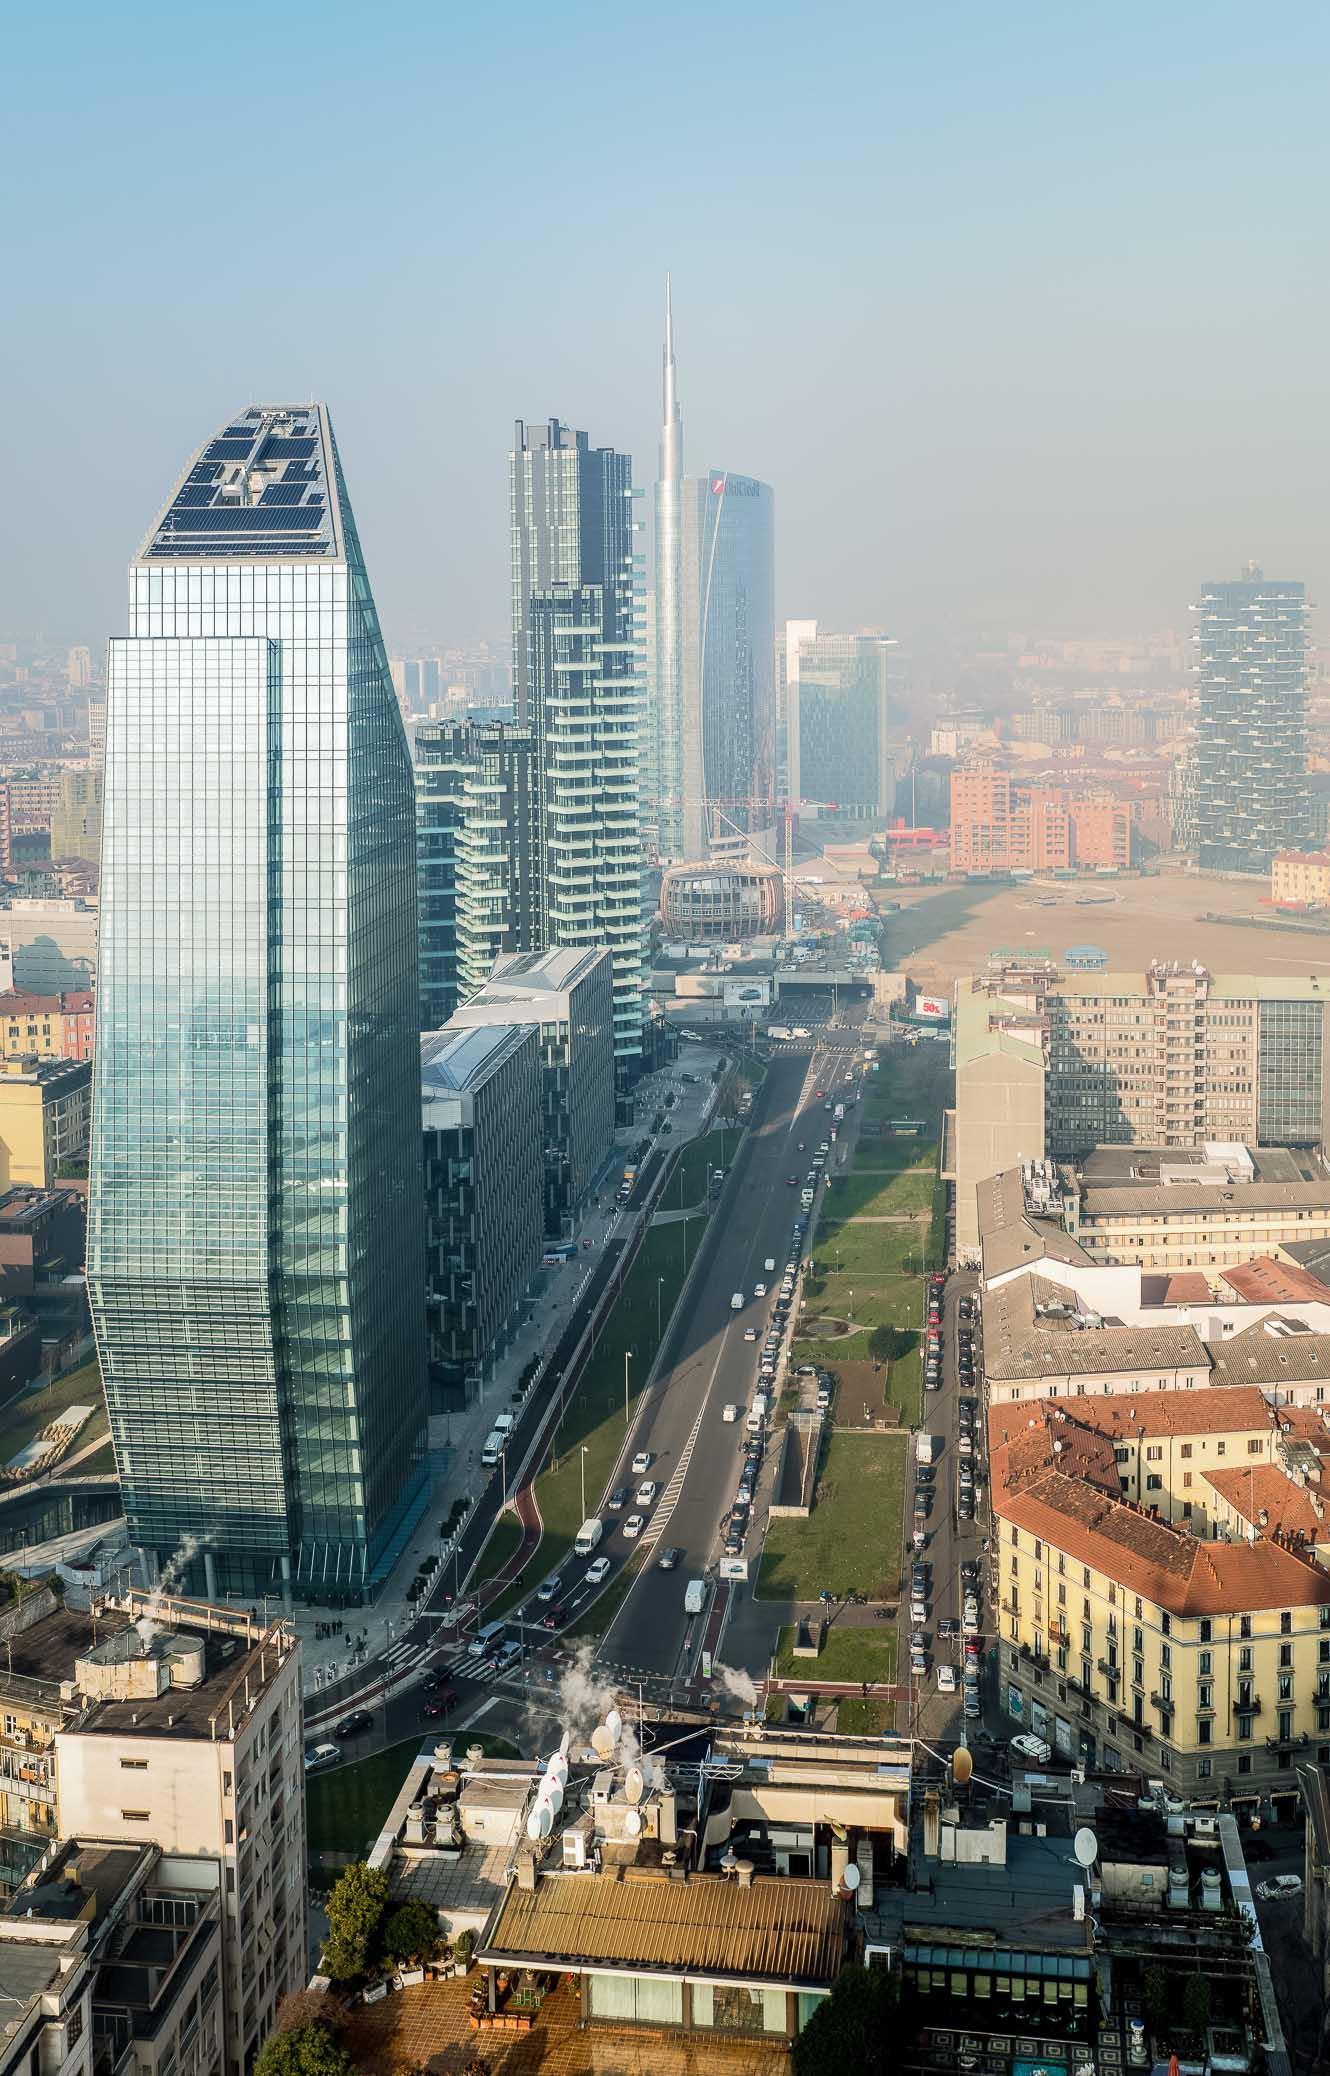 Milan's bustling business district